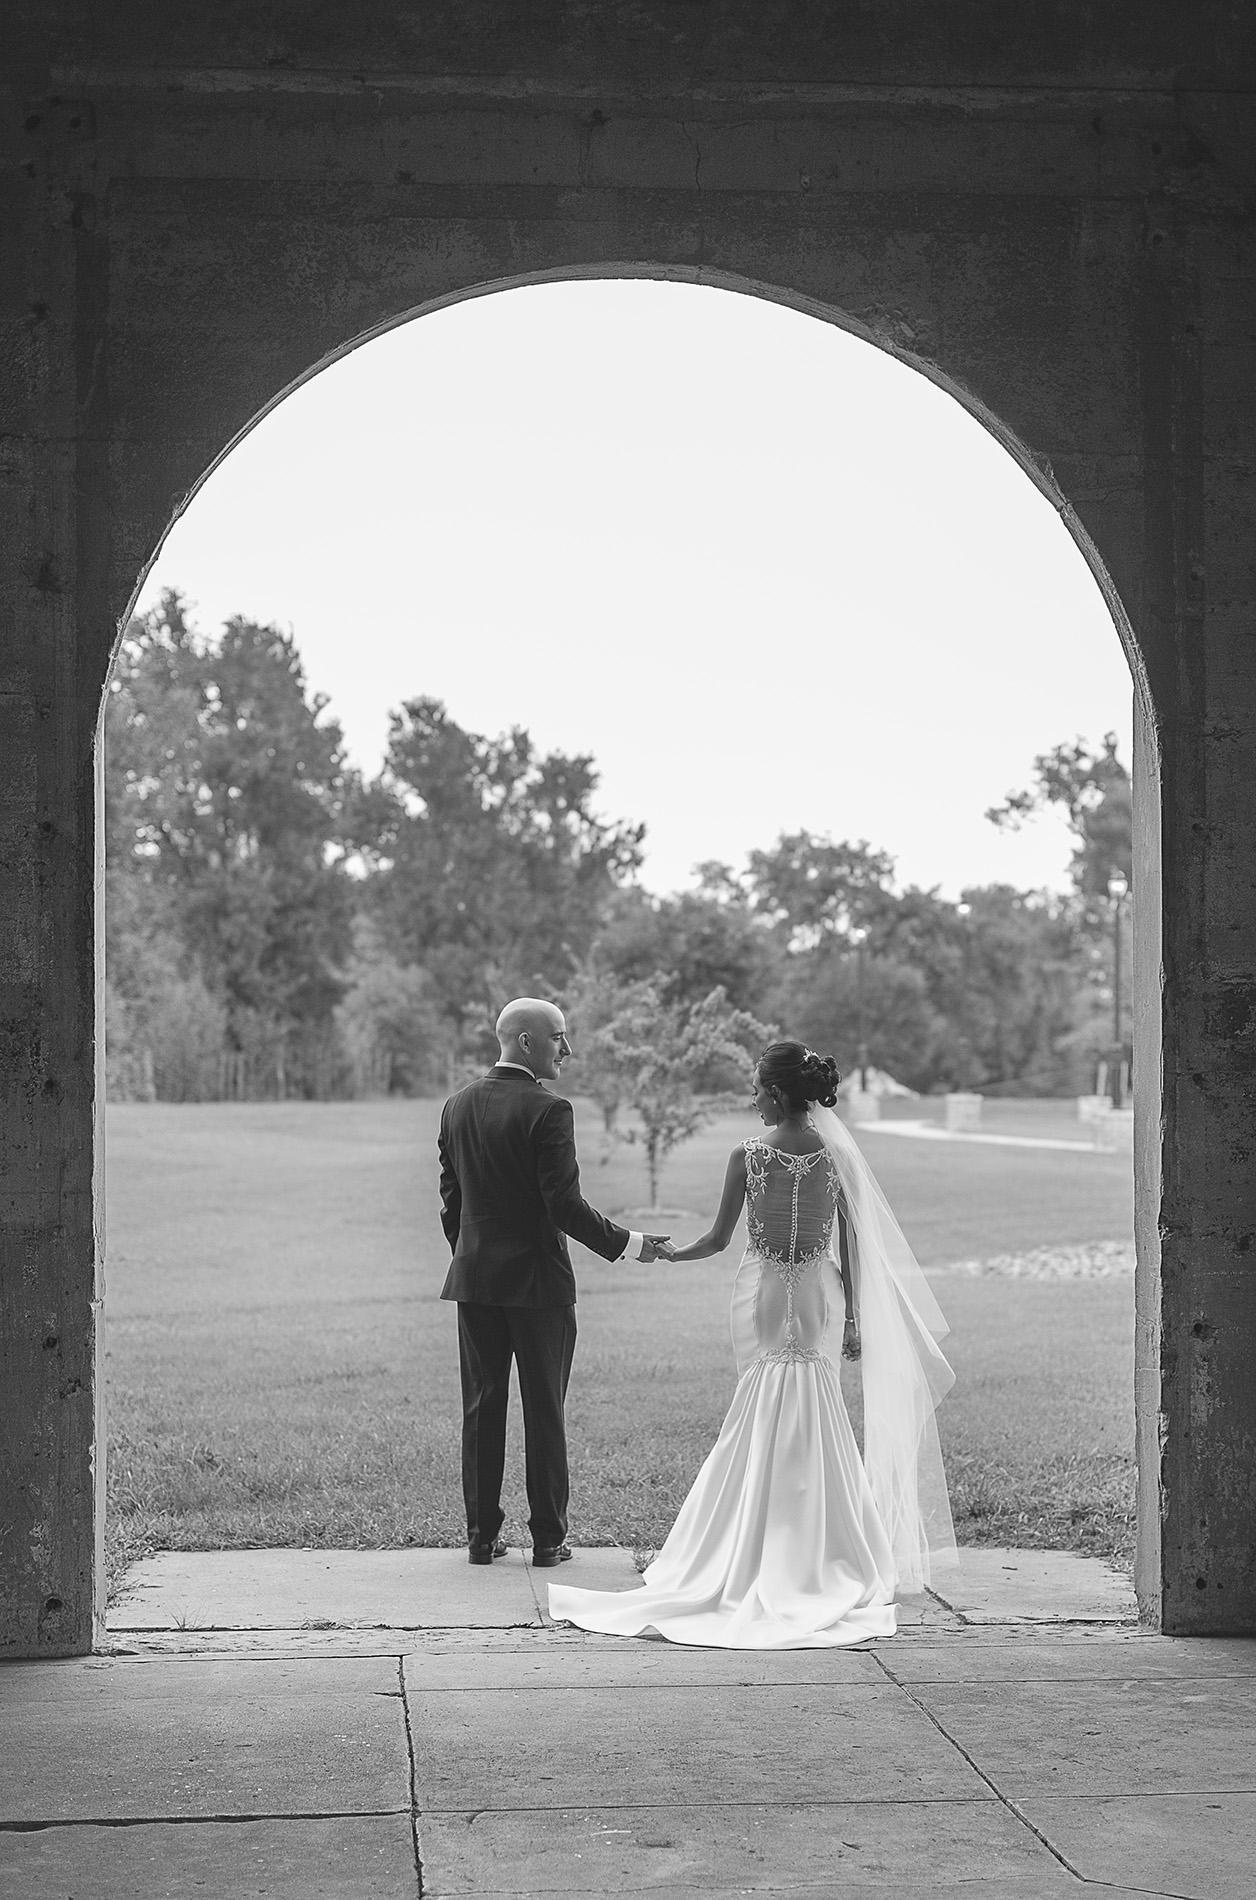 Houston-venue-Olde-Dobbin-Station-Romantic-Classic-Wedding-Photographer-028.jpg